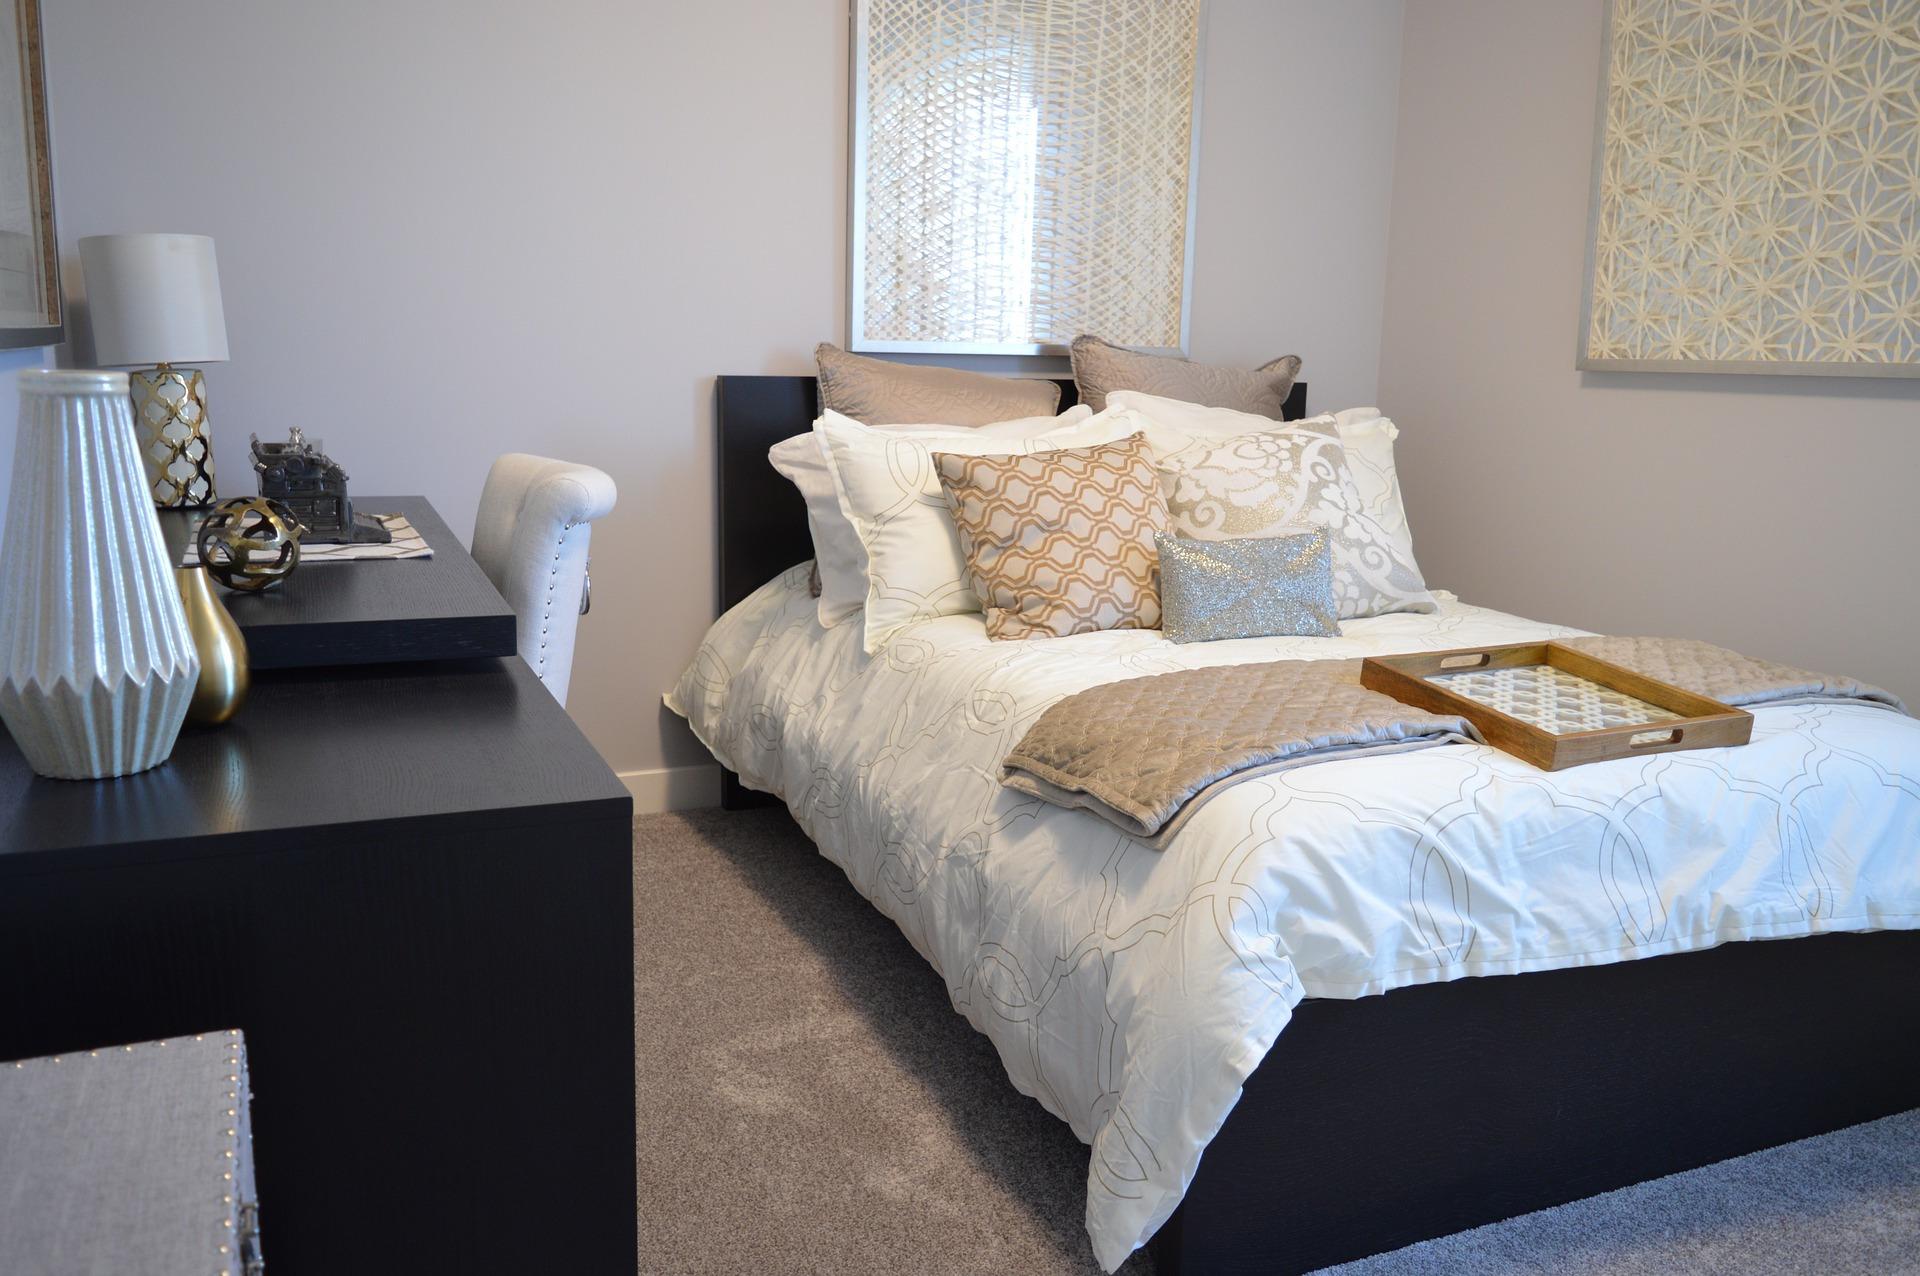 materace Mollflex materace sypialnia